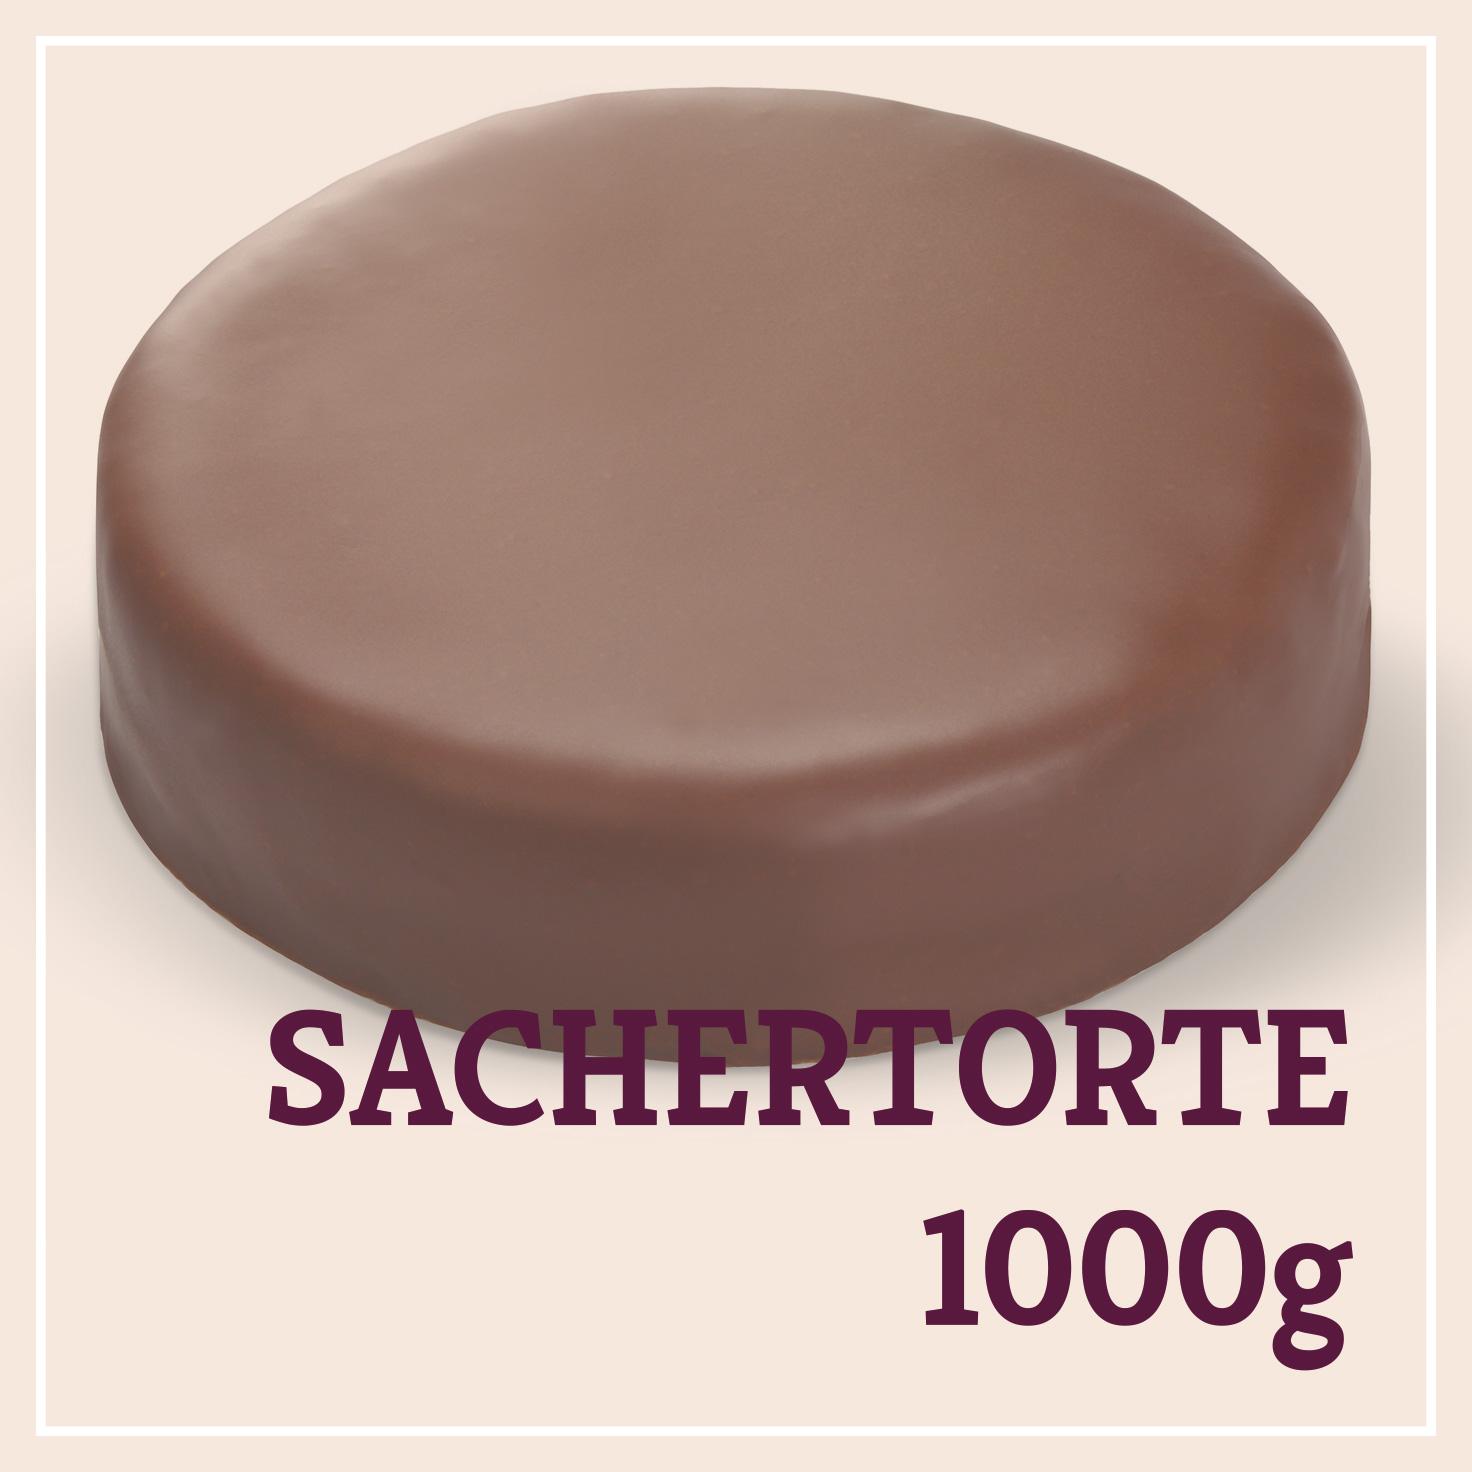 Heiss & Süß - Sachertorte 1000g